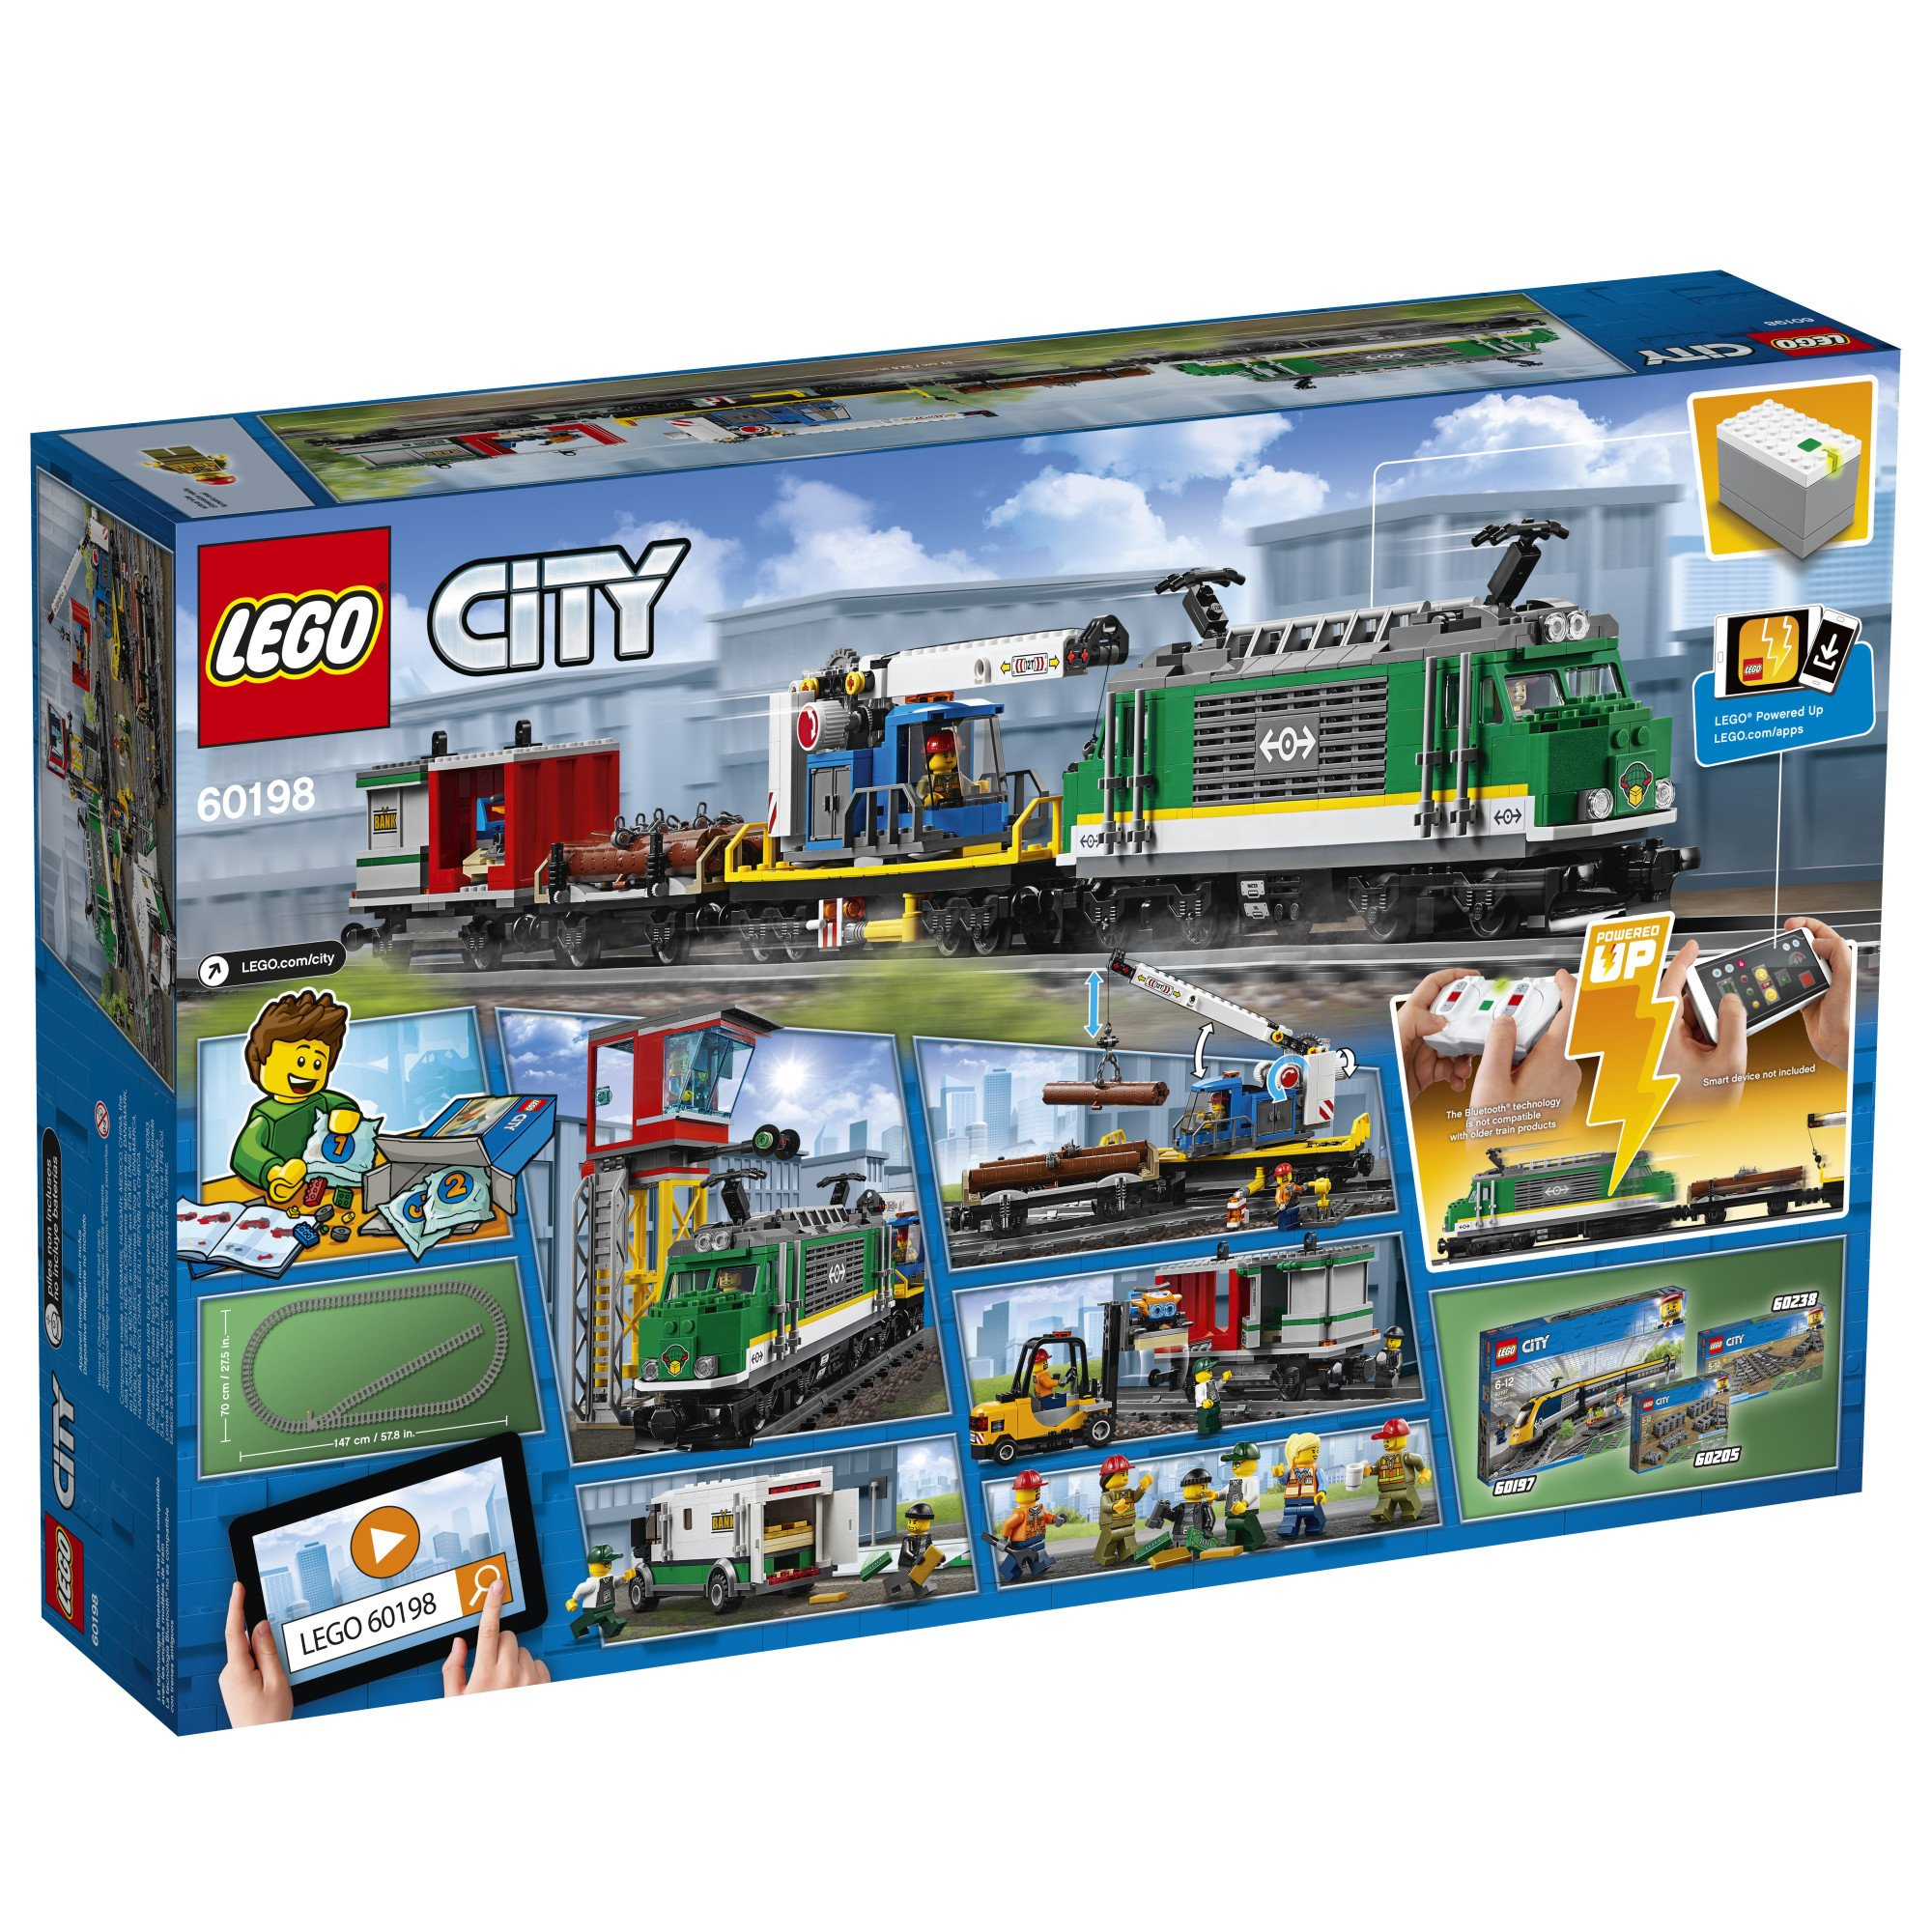 LEGO City Cargo Train 60198 Remote Control Train Building ...